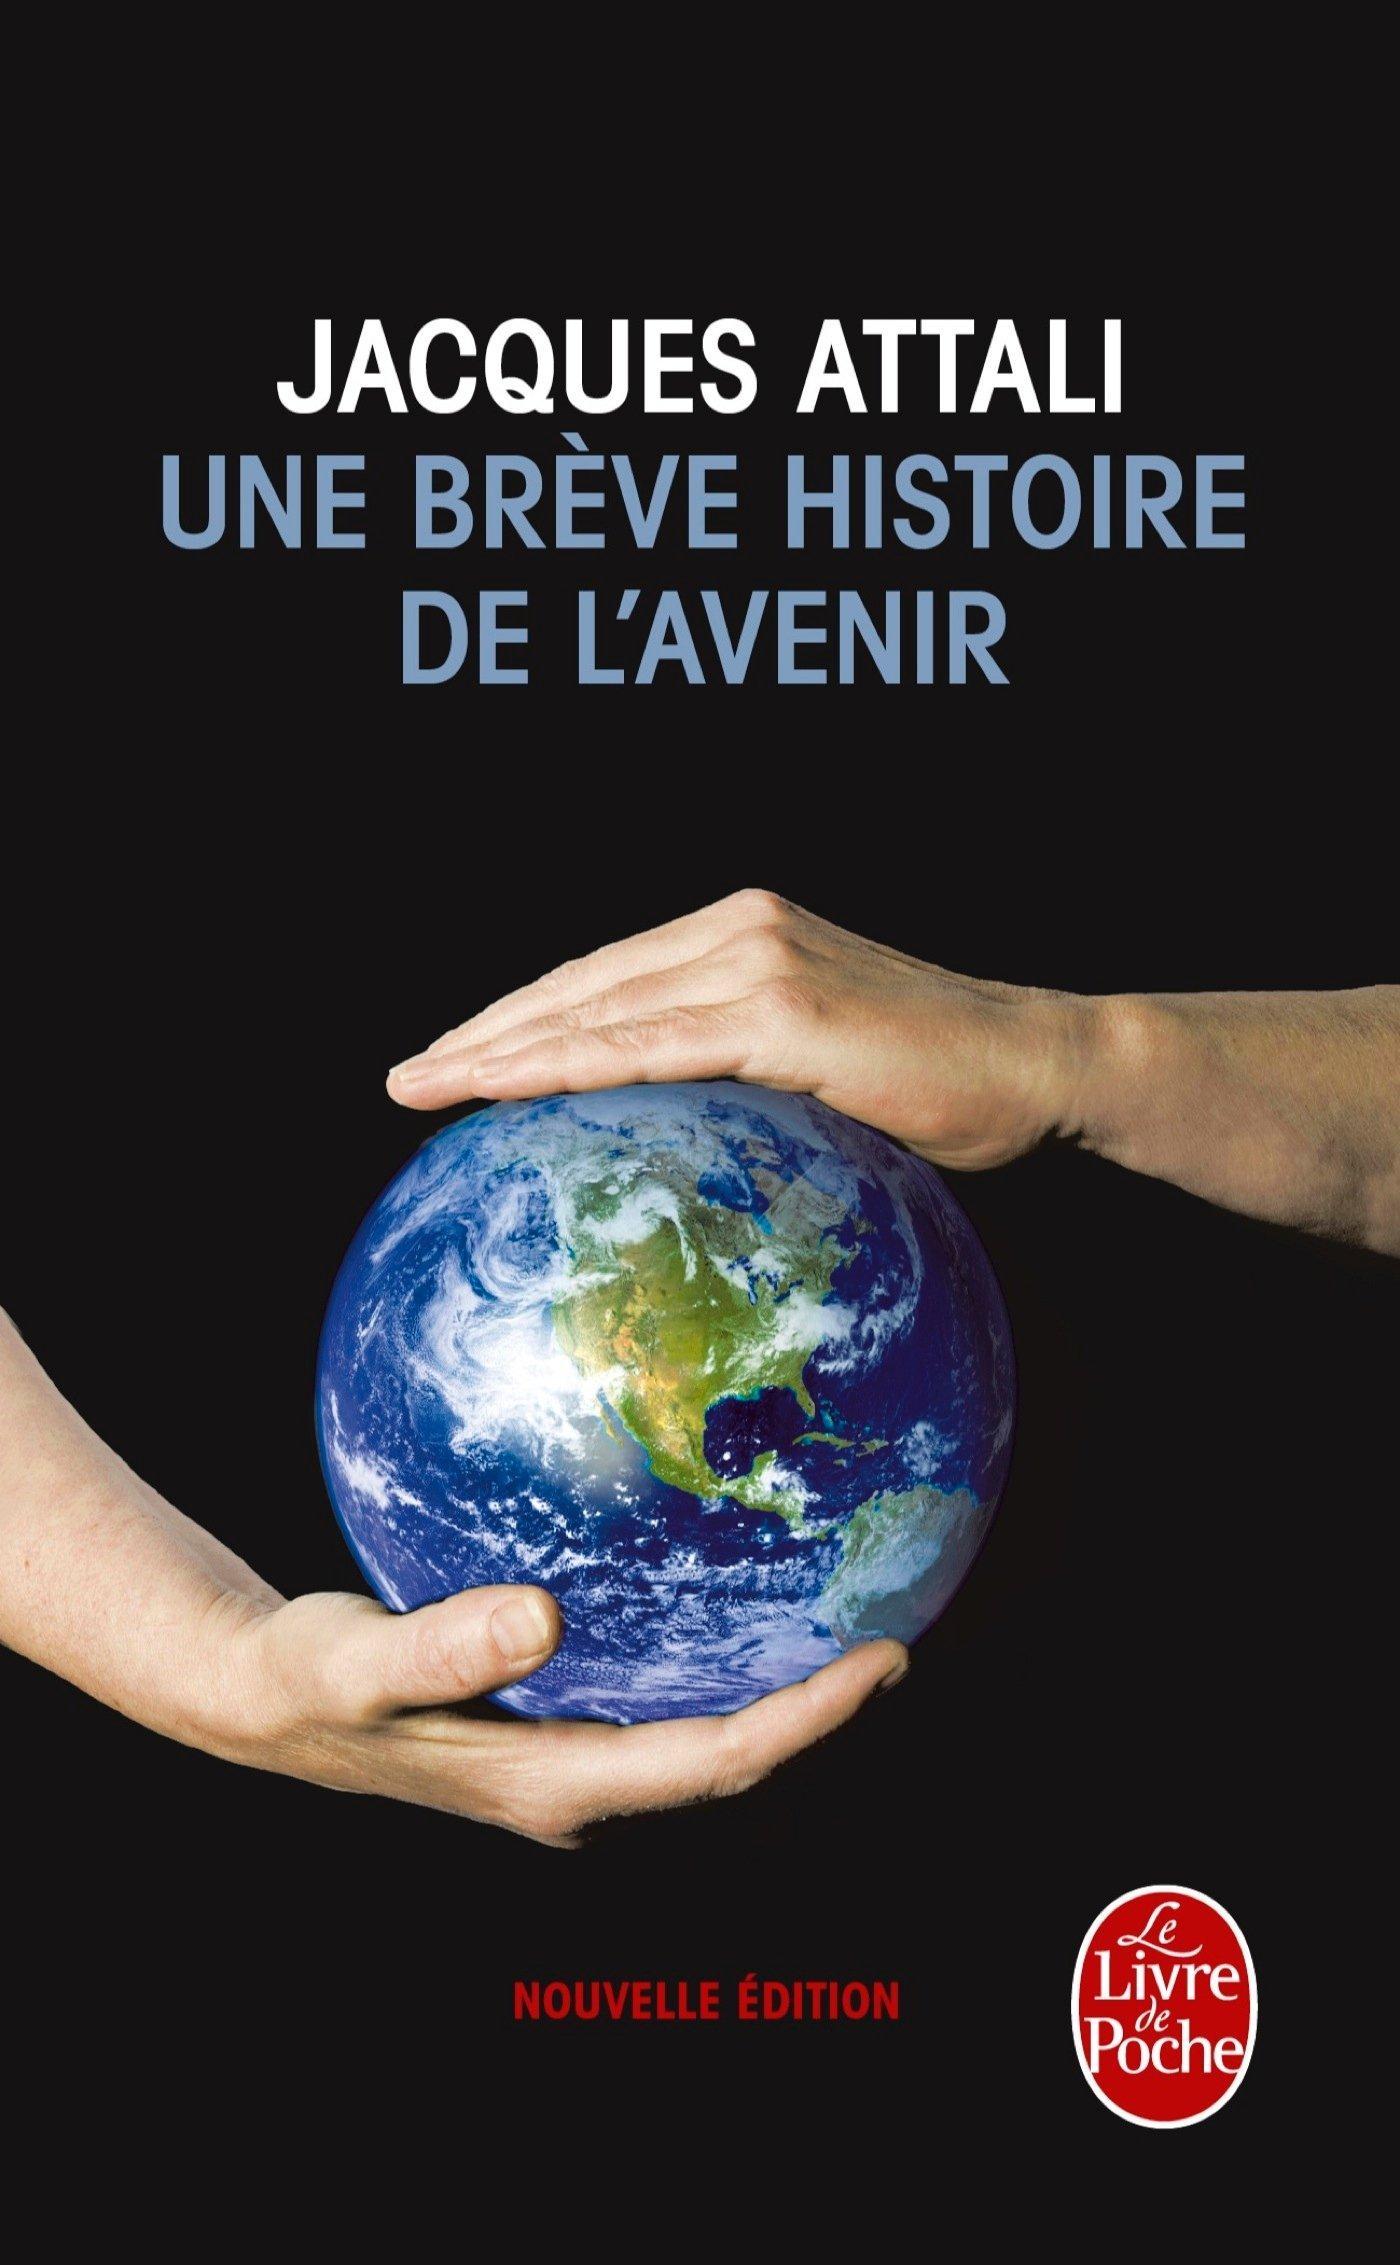 Une Breve Histoire de L'Avenir (Le Livre de Poche) (French Edition):  Jacques Attali: 9782253159698: Amazon.com: Books